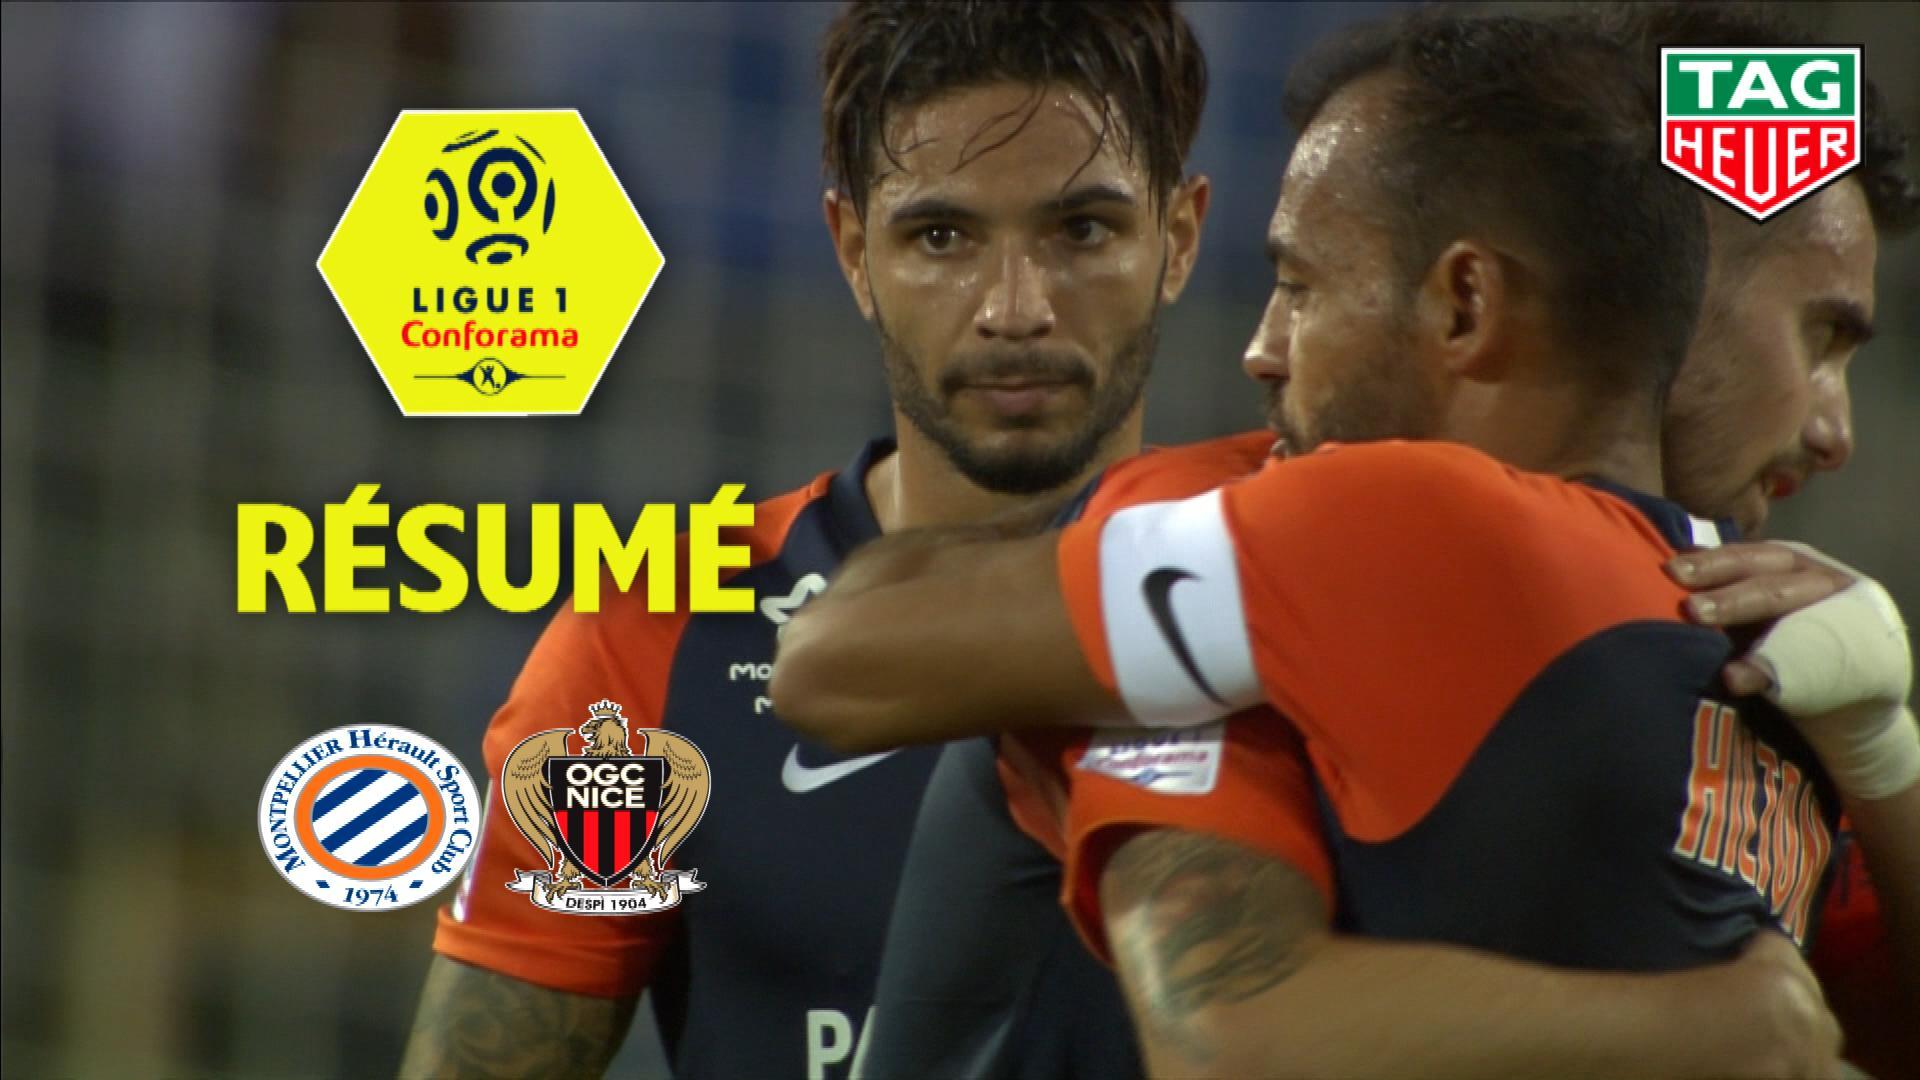 Montpellier Hérault SC - OGC Nice (2-1)  - Résumé - (MHSC-OGCN) / 2019-20